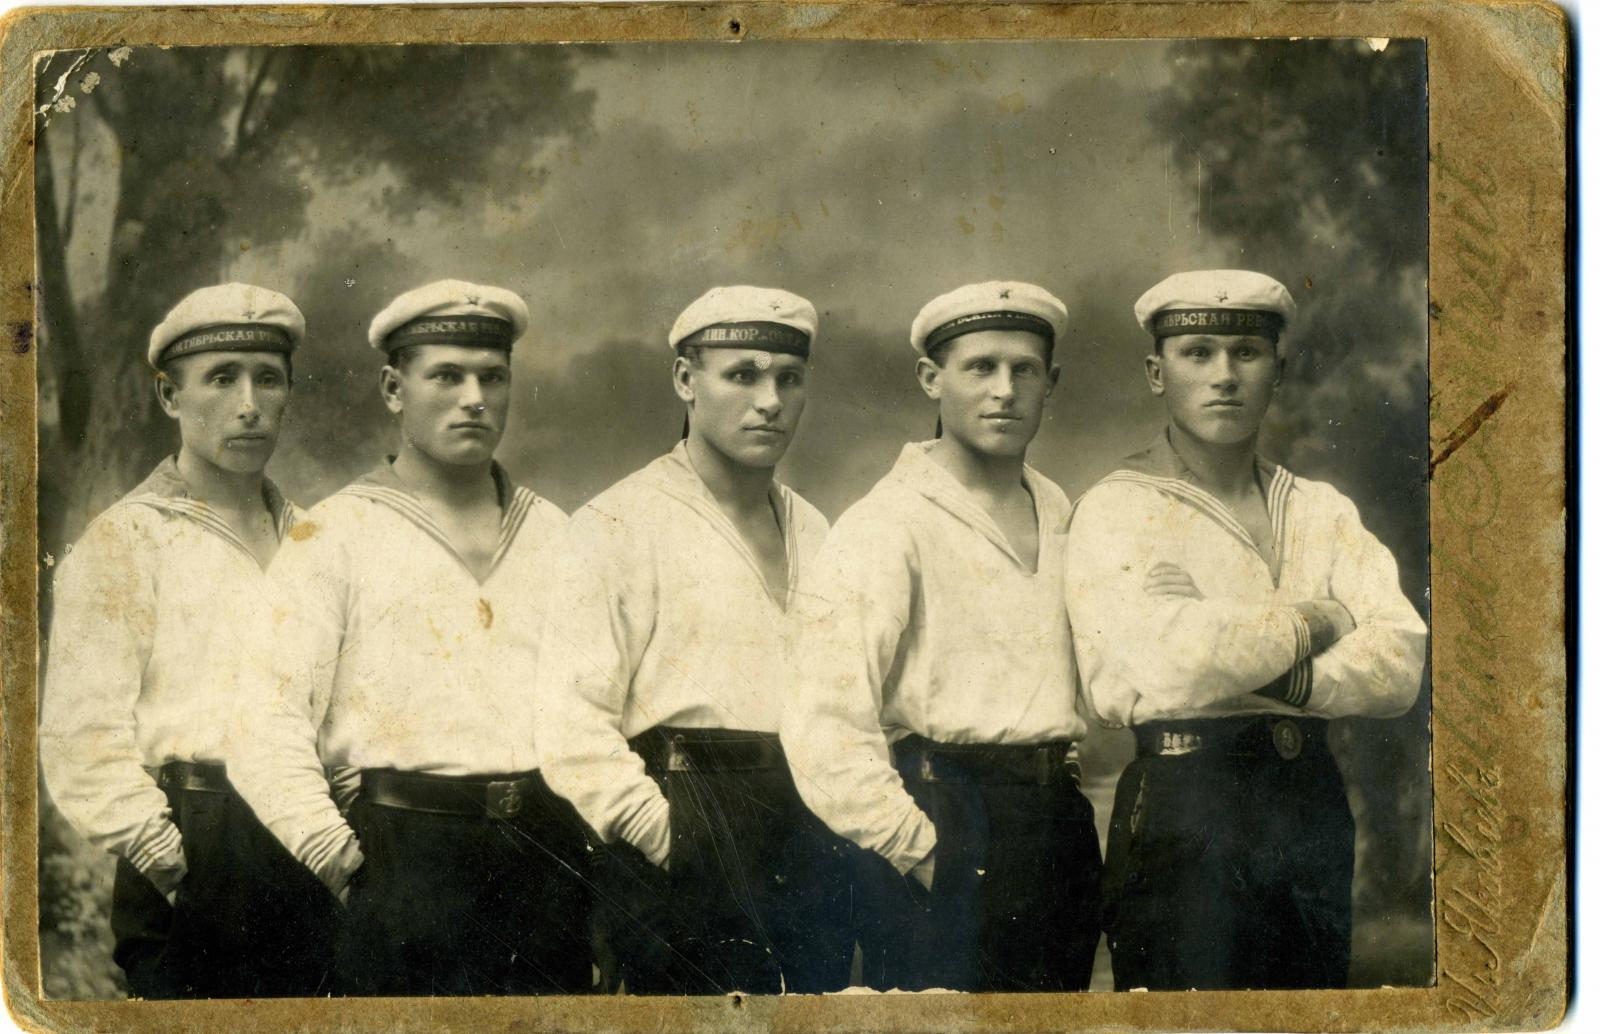 1928. Моряки линкора Октябрьская революция. Кронштадт